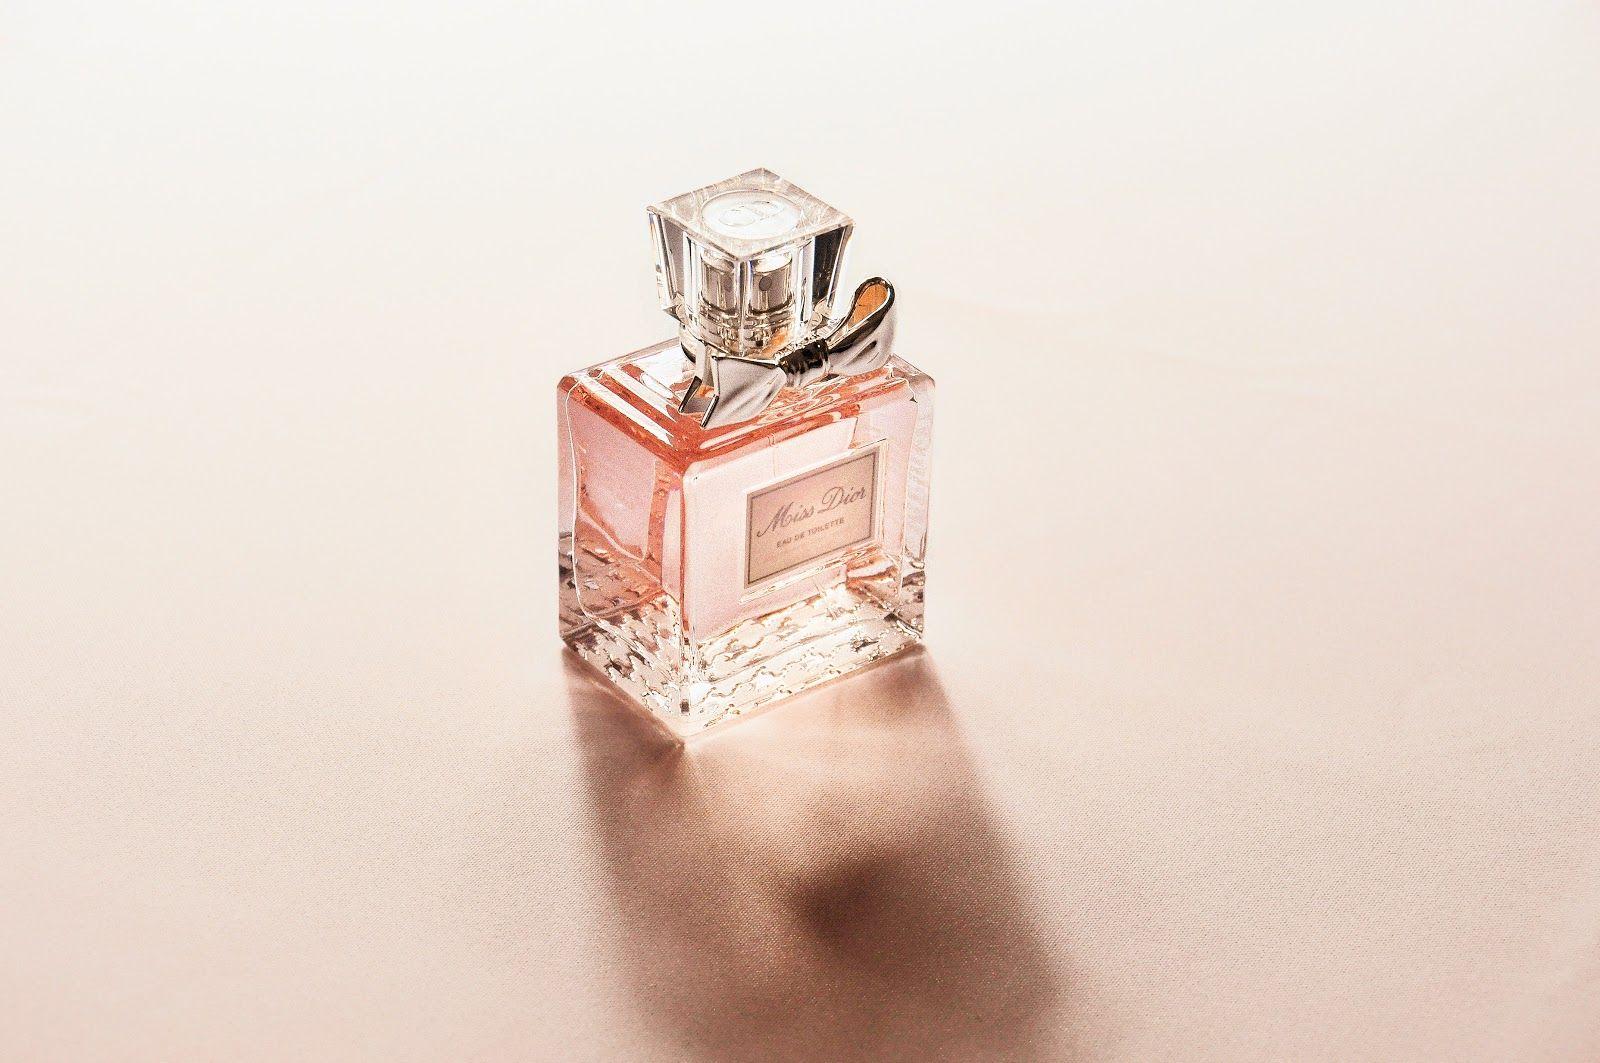 Shipping Miss Dior Perfume Overseas